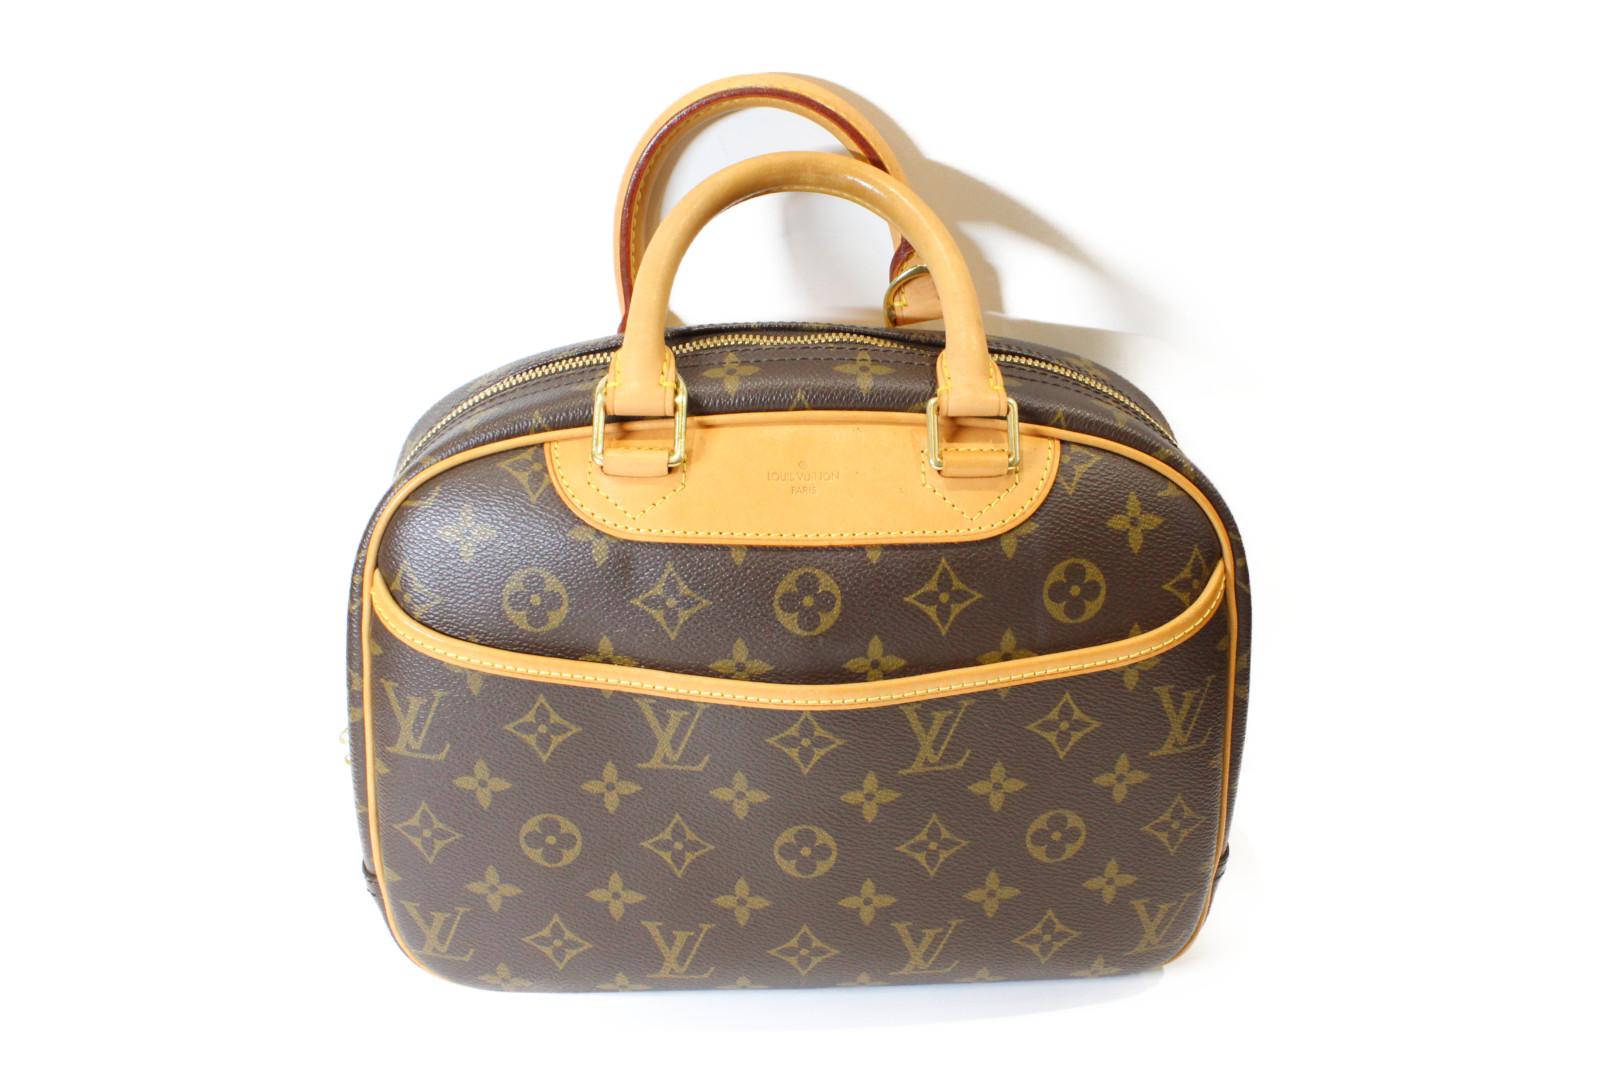 LOUIS VUITTON ルイヴィトントゥルーヴィル M42228ハンドバッグ コンパクト普段使い プレゼント包装可【中古】